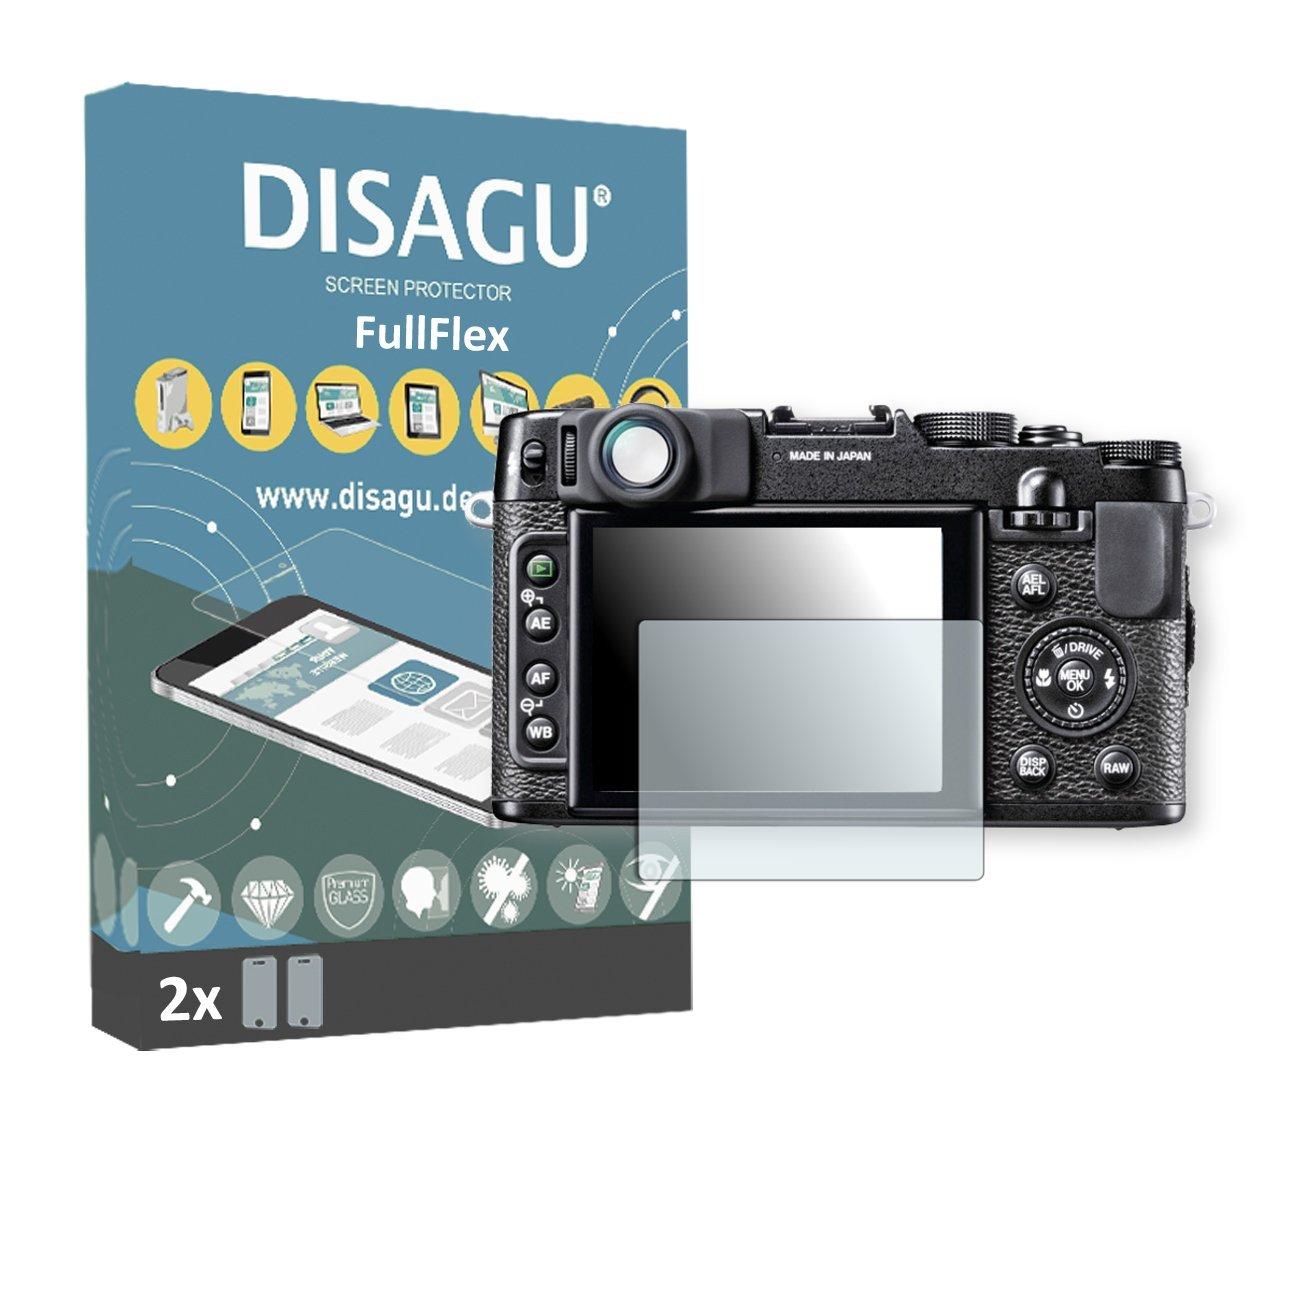 2 x Disagu FullFlex screen protector for Fujifilm X10 foil screen protector